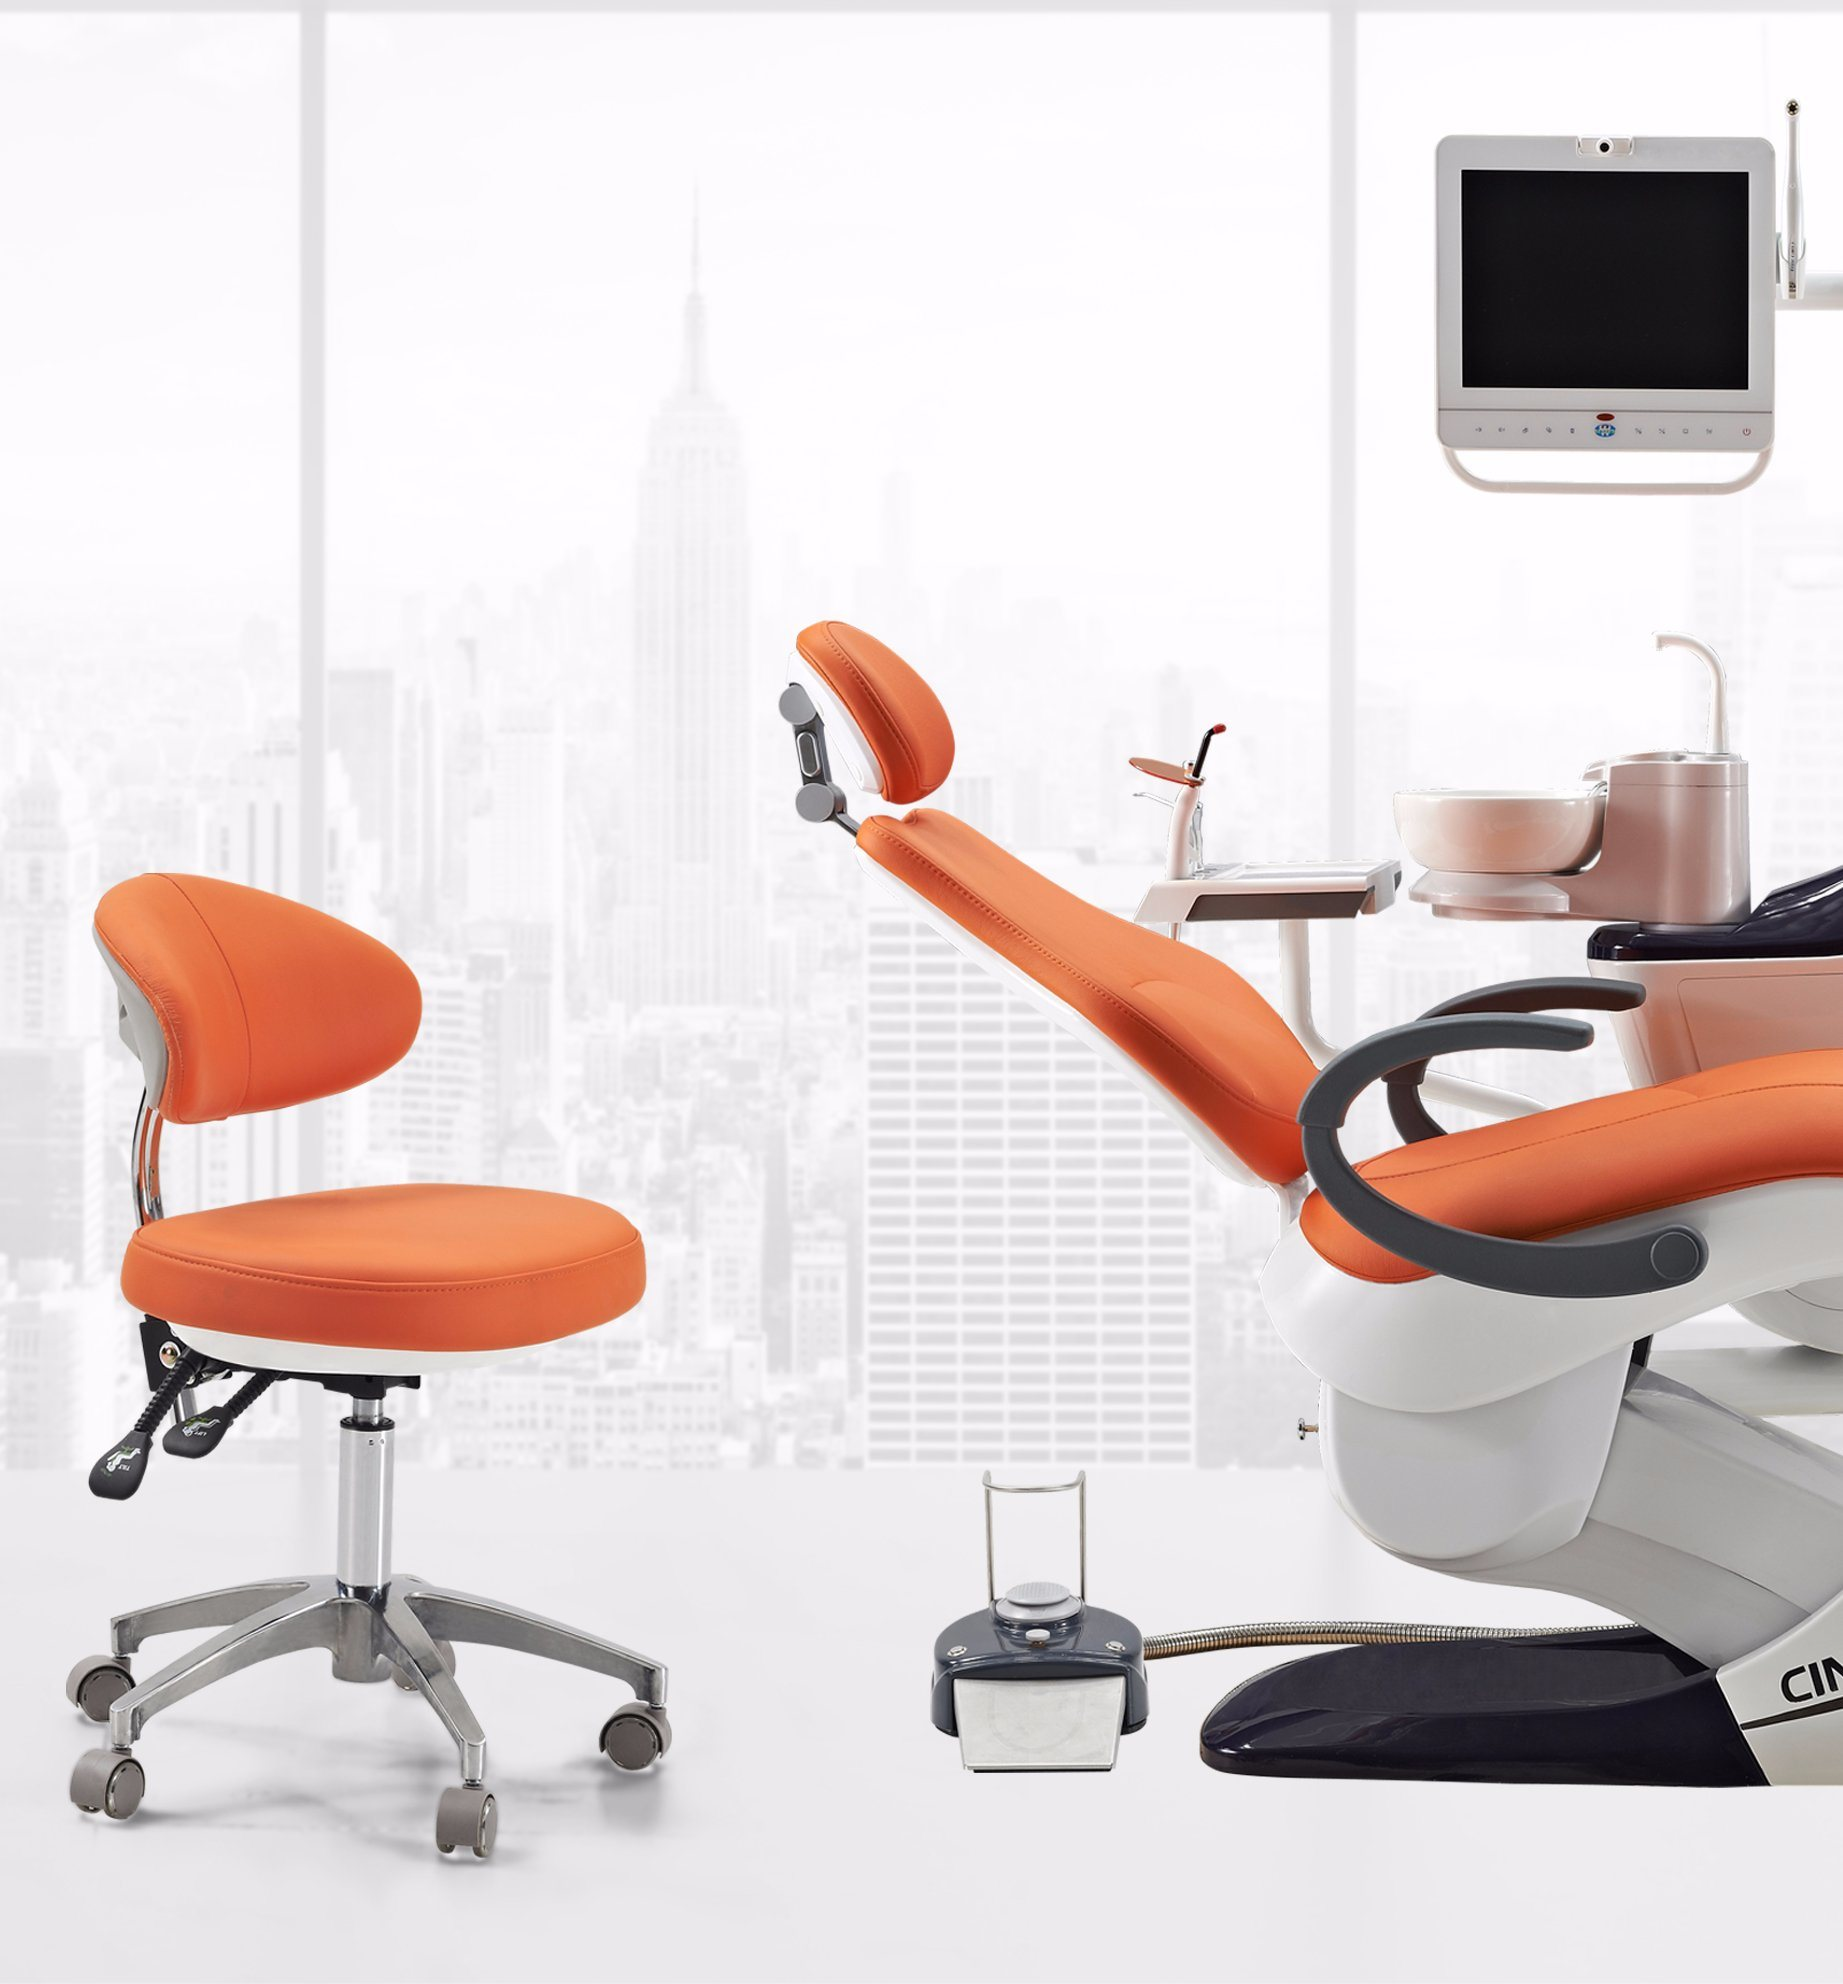 Multifuction Dental Chair in Foshan City